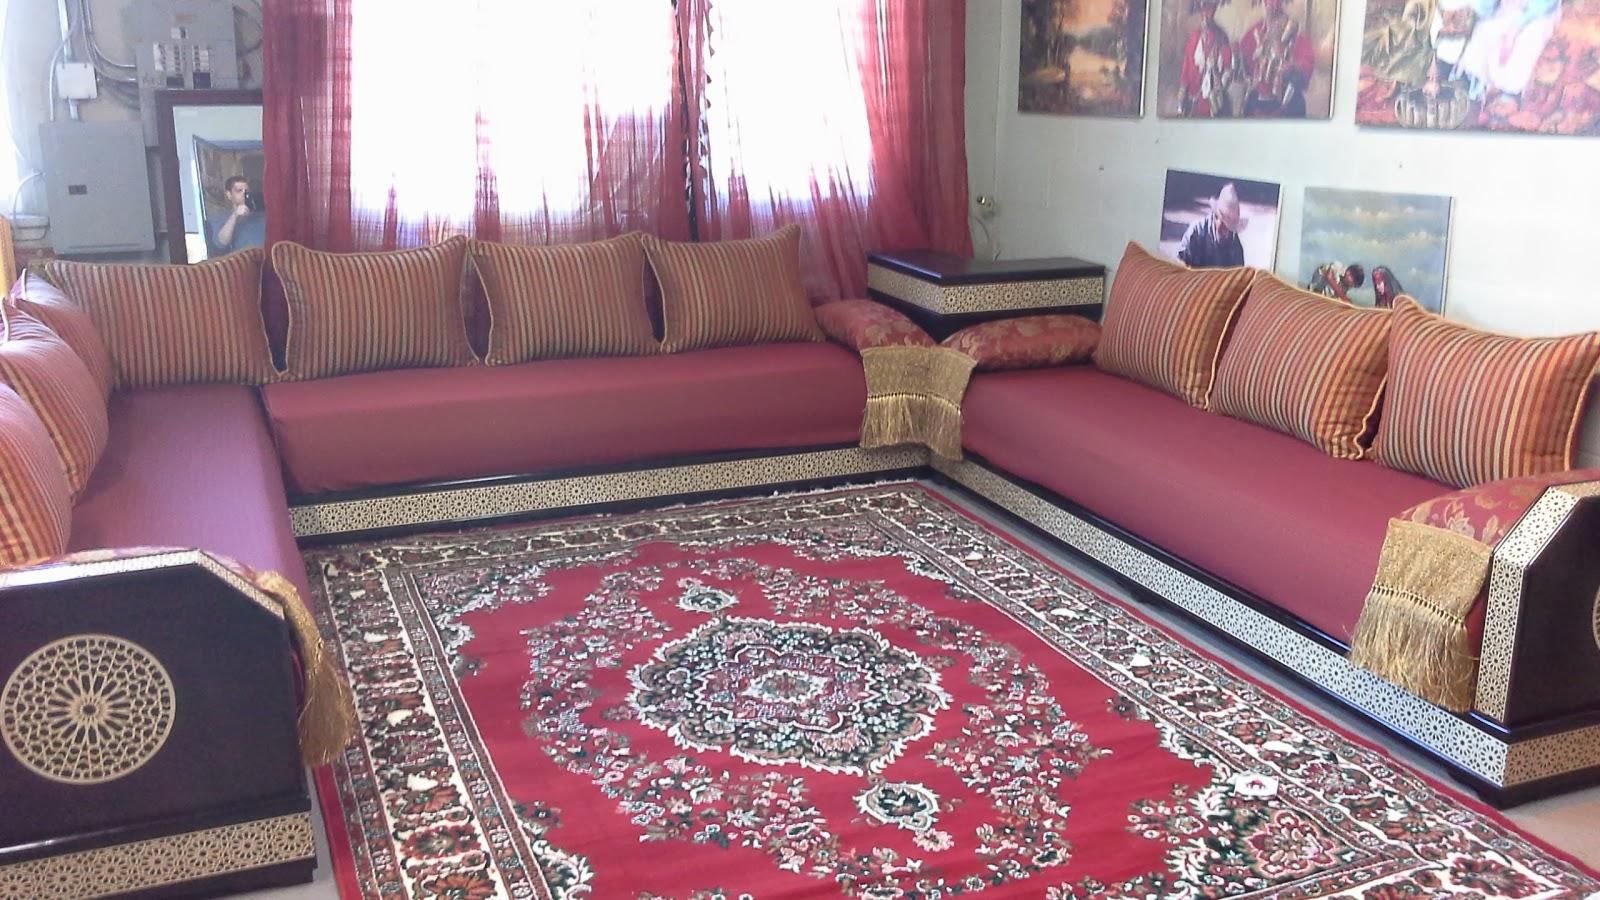 Les Salon Marocain | Salon Marocain Appartement Temoin Bassatine ...